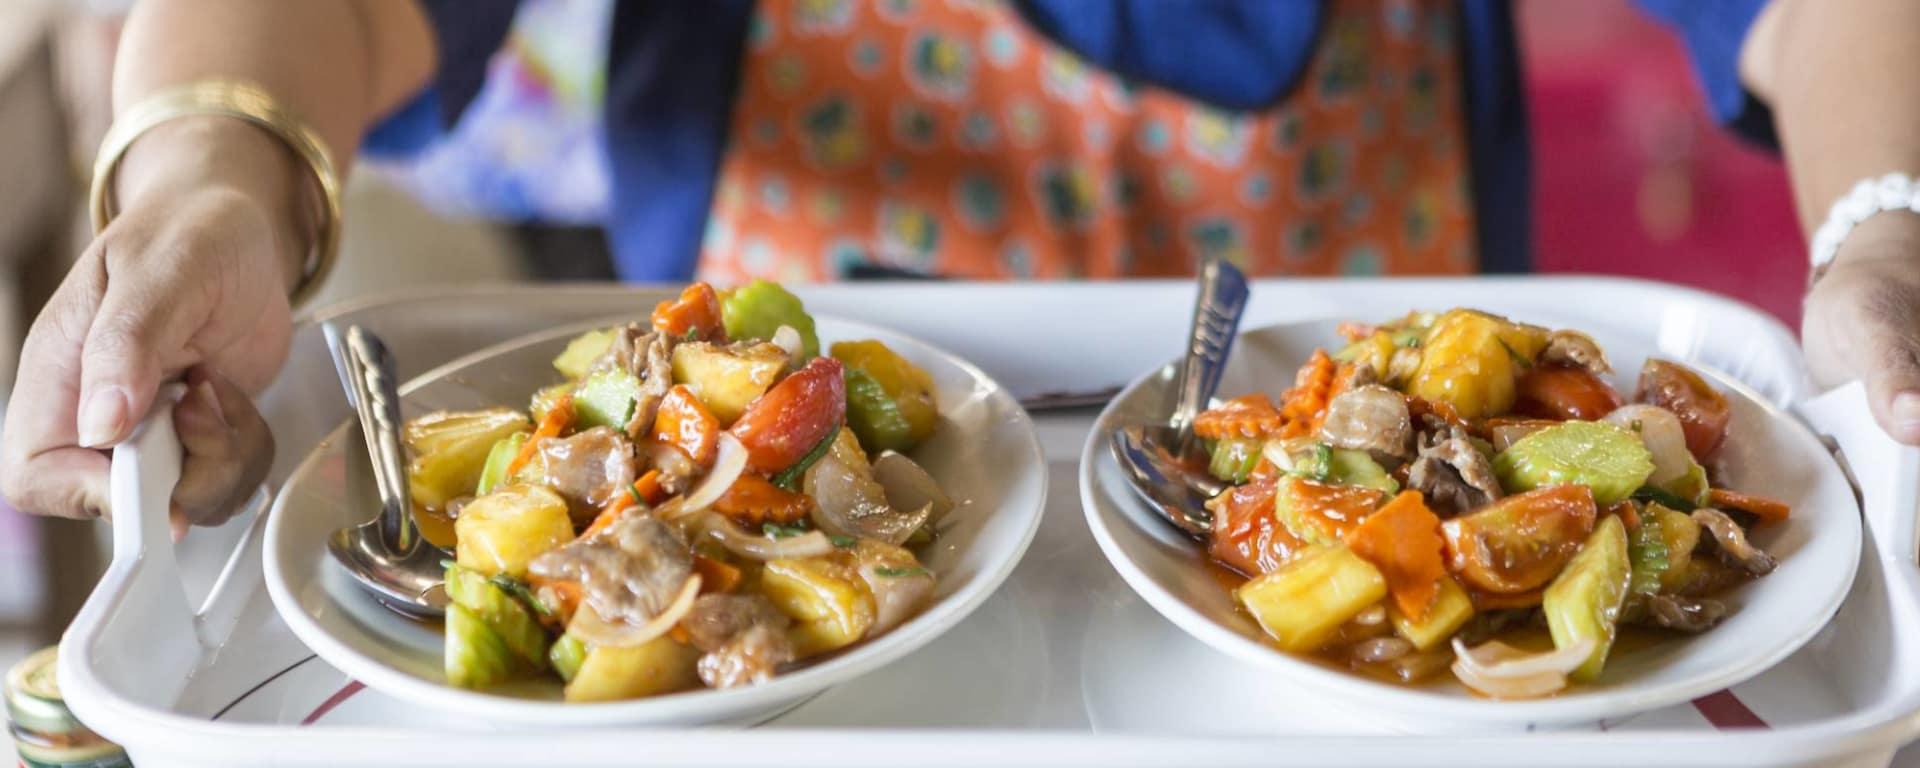 Air's Thai Culinary Kitchen - Cours de cuisine à Chiang Mai: Cooking class